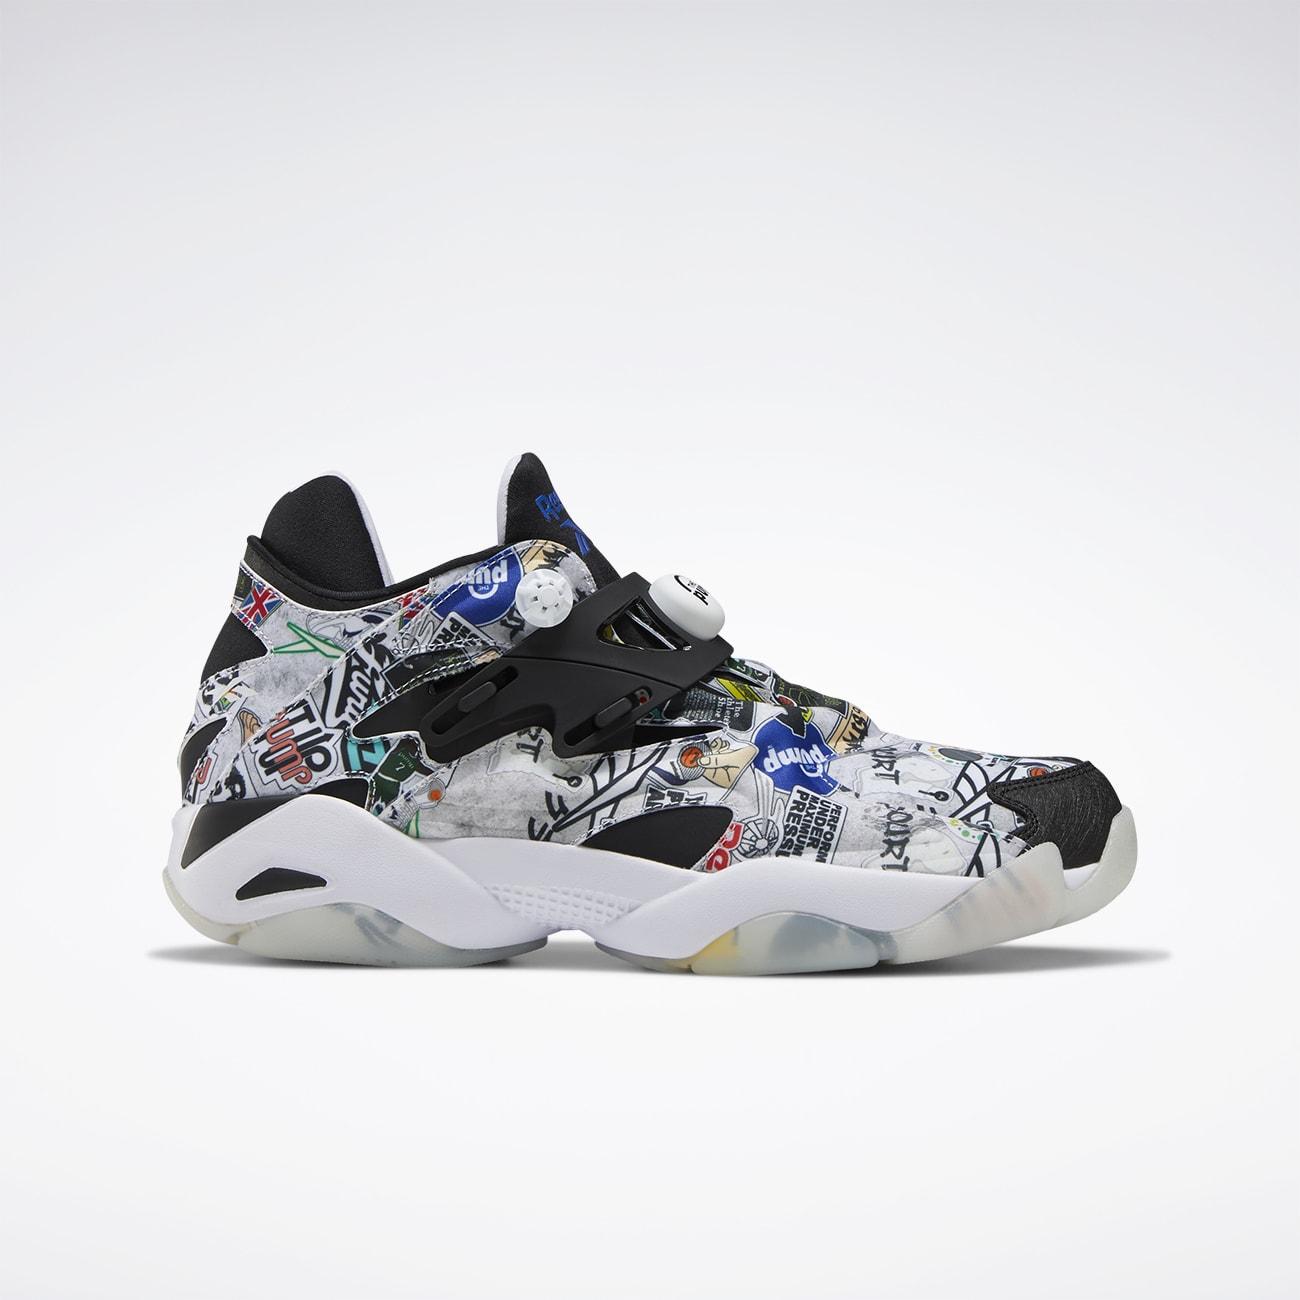 NewShoes_FW7826